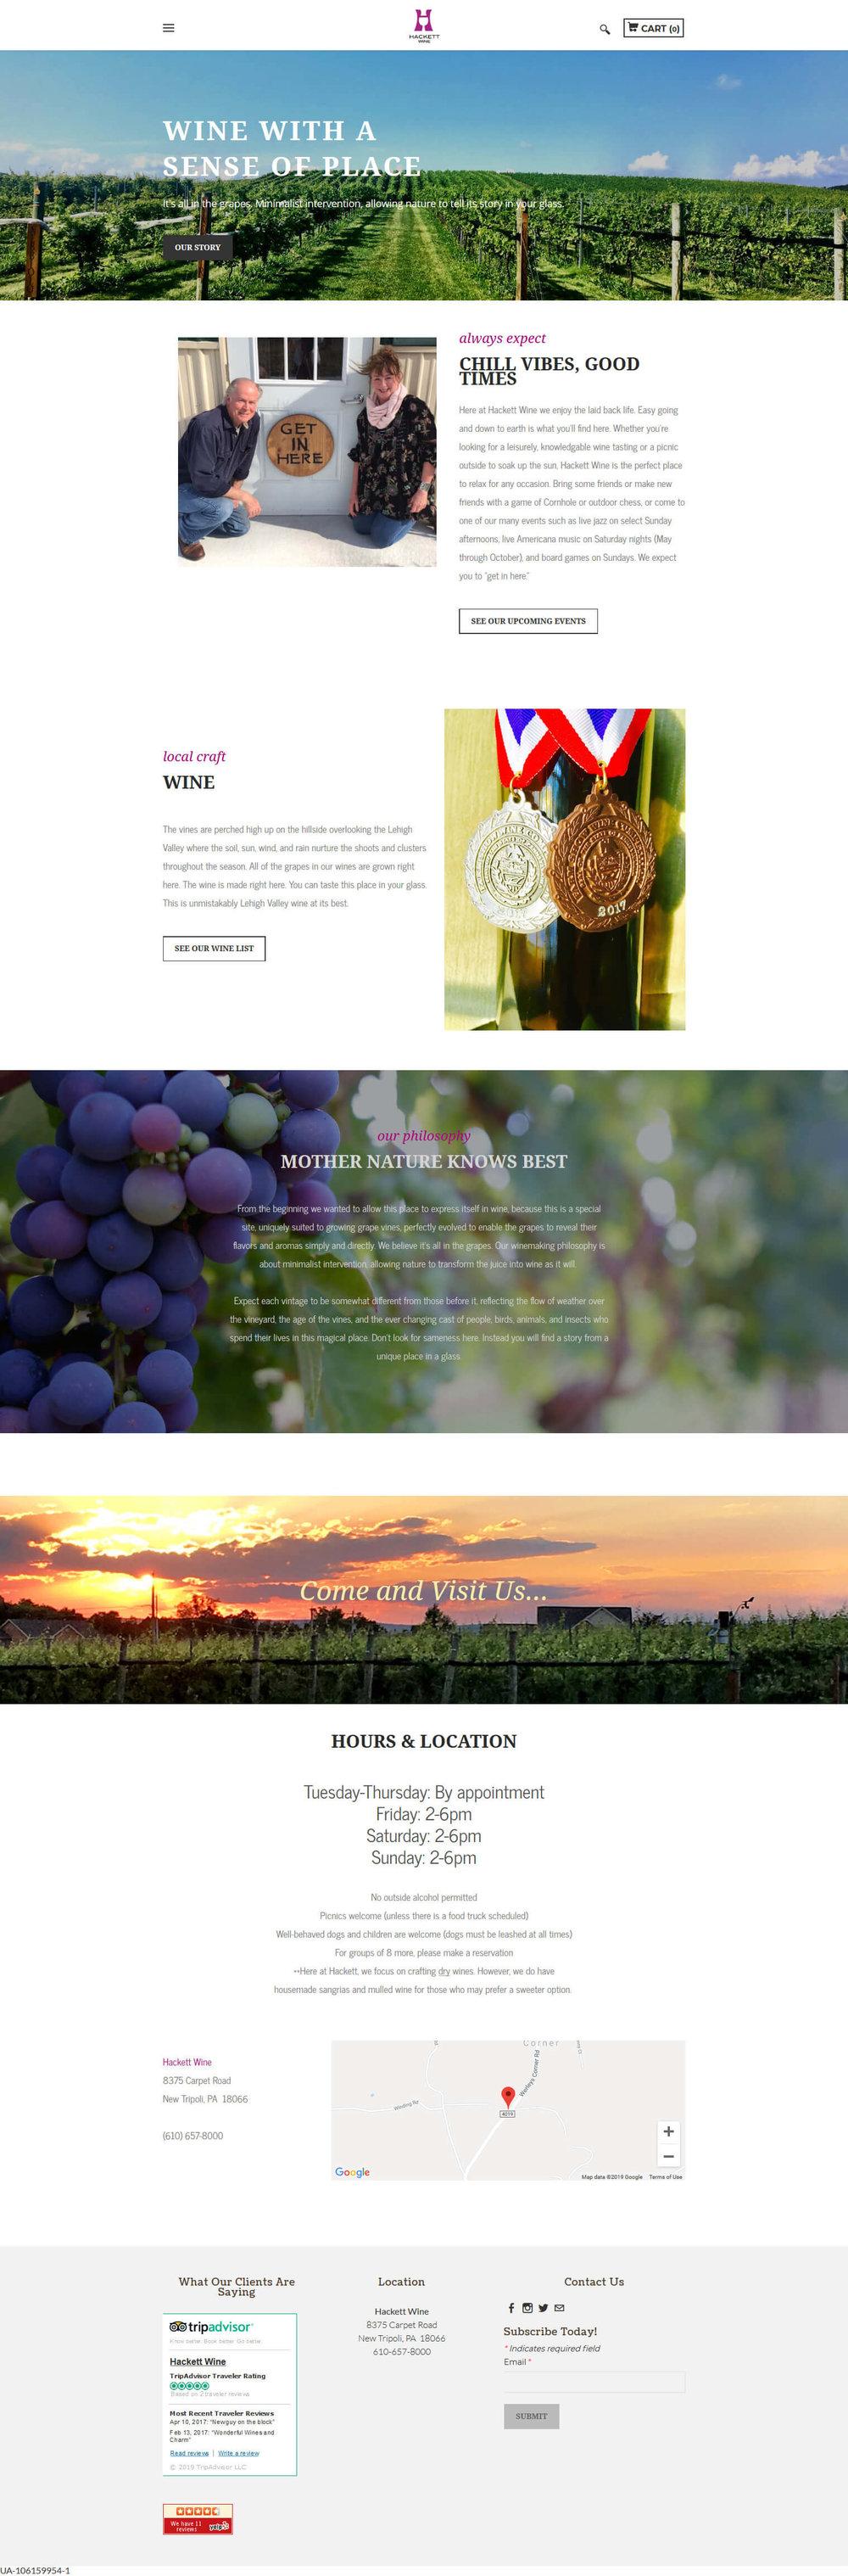 Hackett Wine vineyard and winery website design